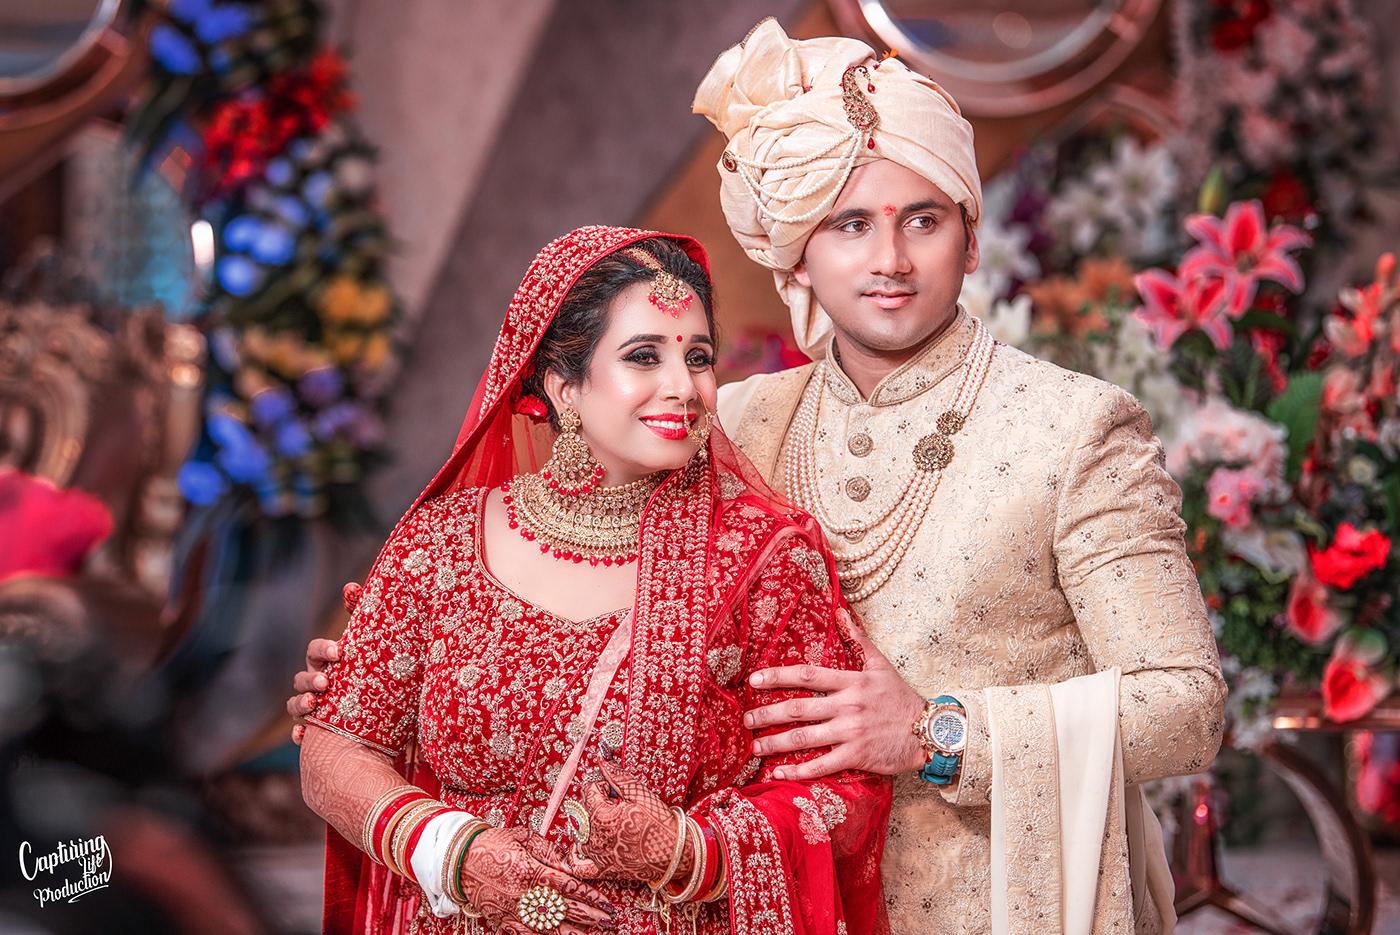 Image may contain: person, bride and fashion accessory